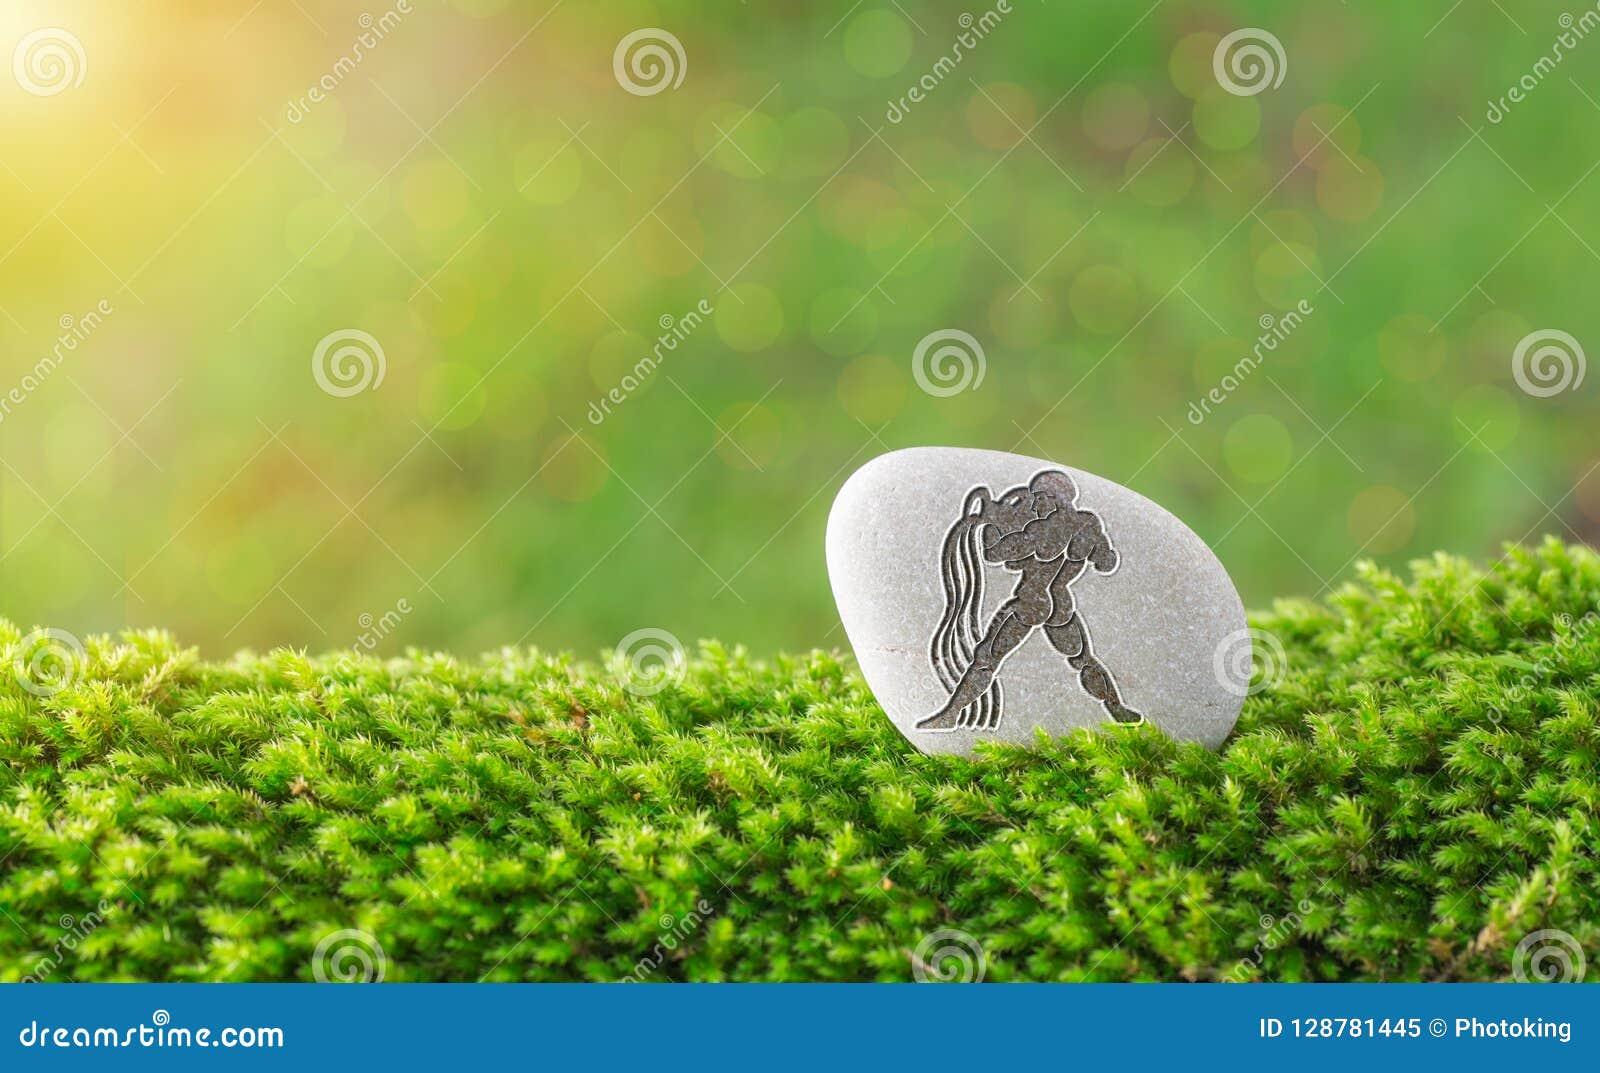 Zodiac Υδροχόου σύμβολο στην πέτρα